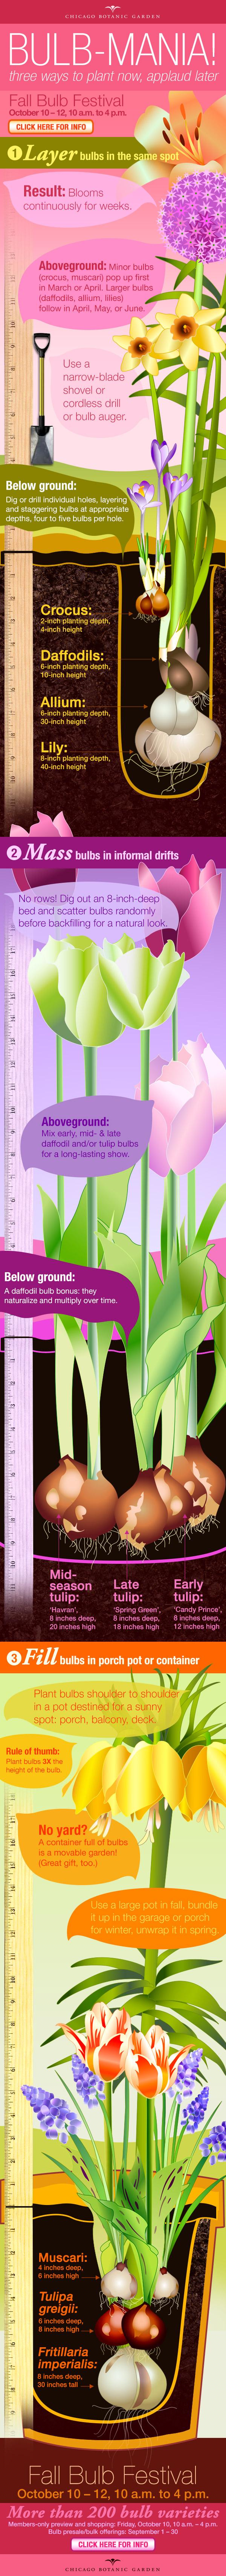 ILLUSTRATION: Bulb planting infographic.